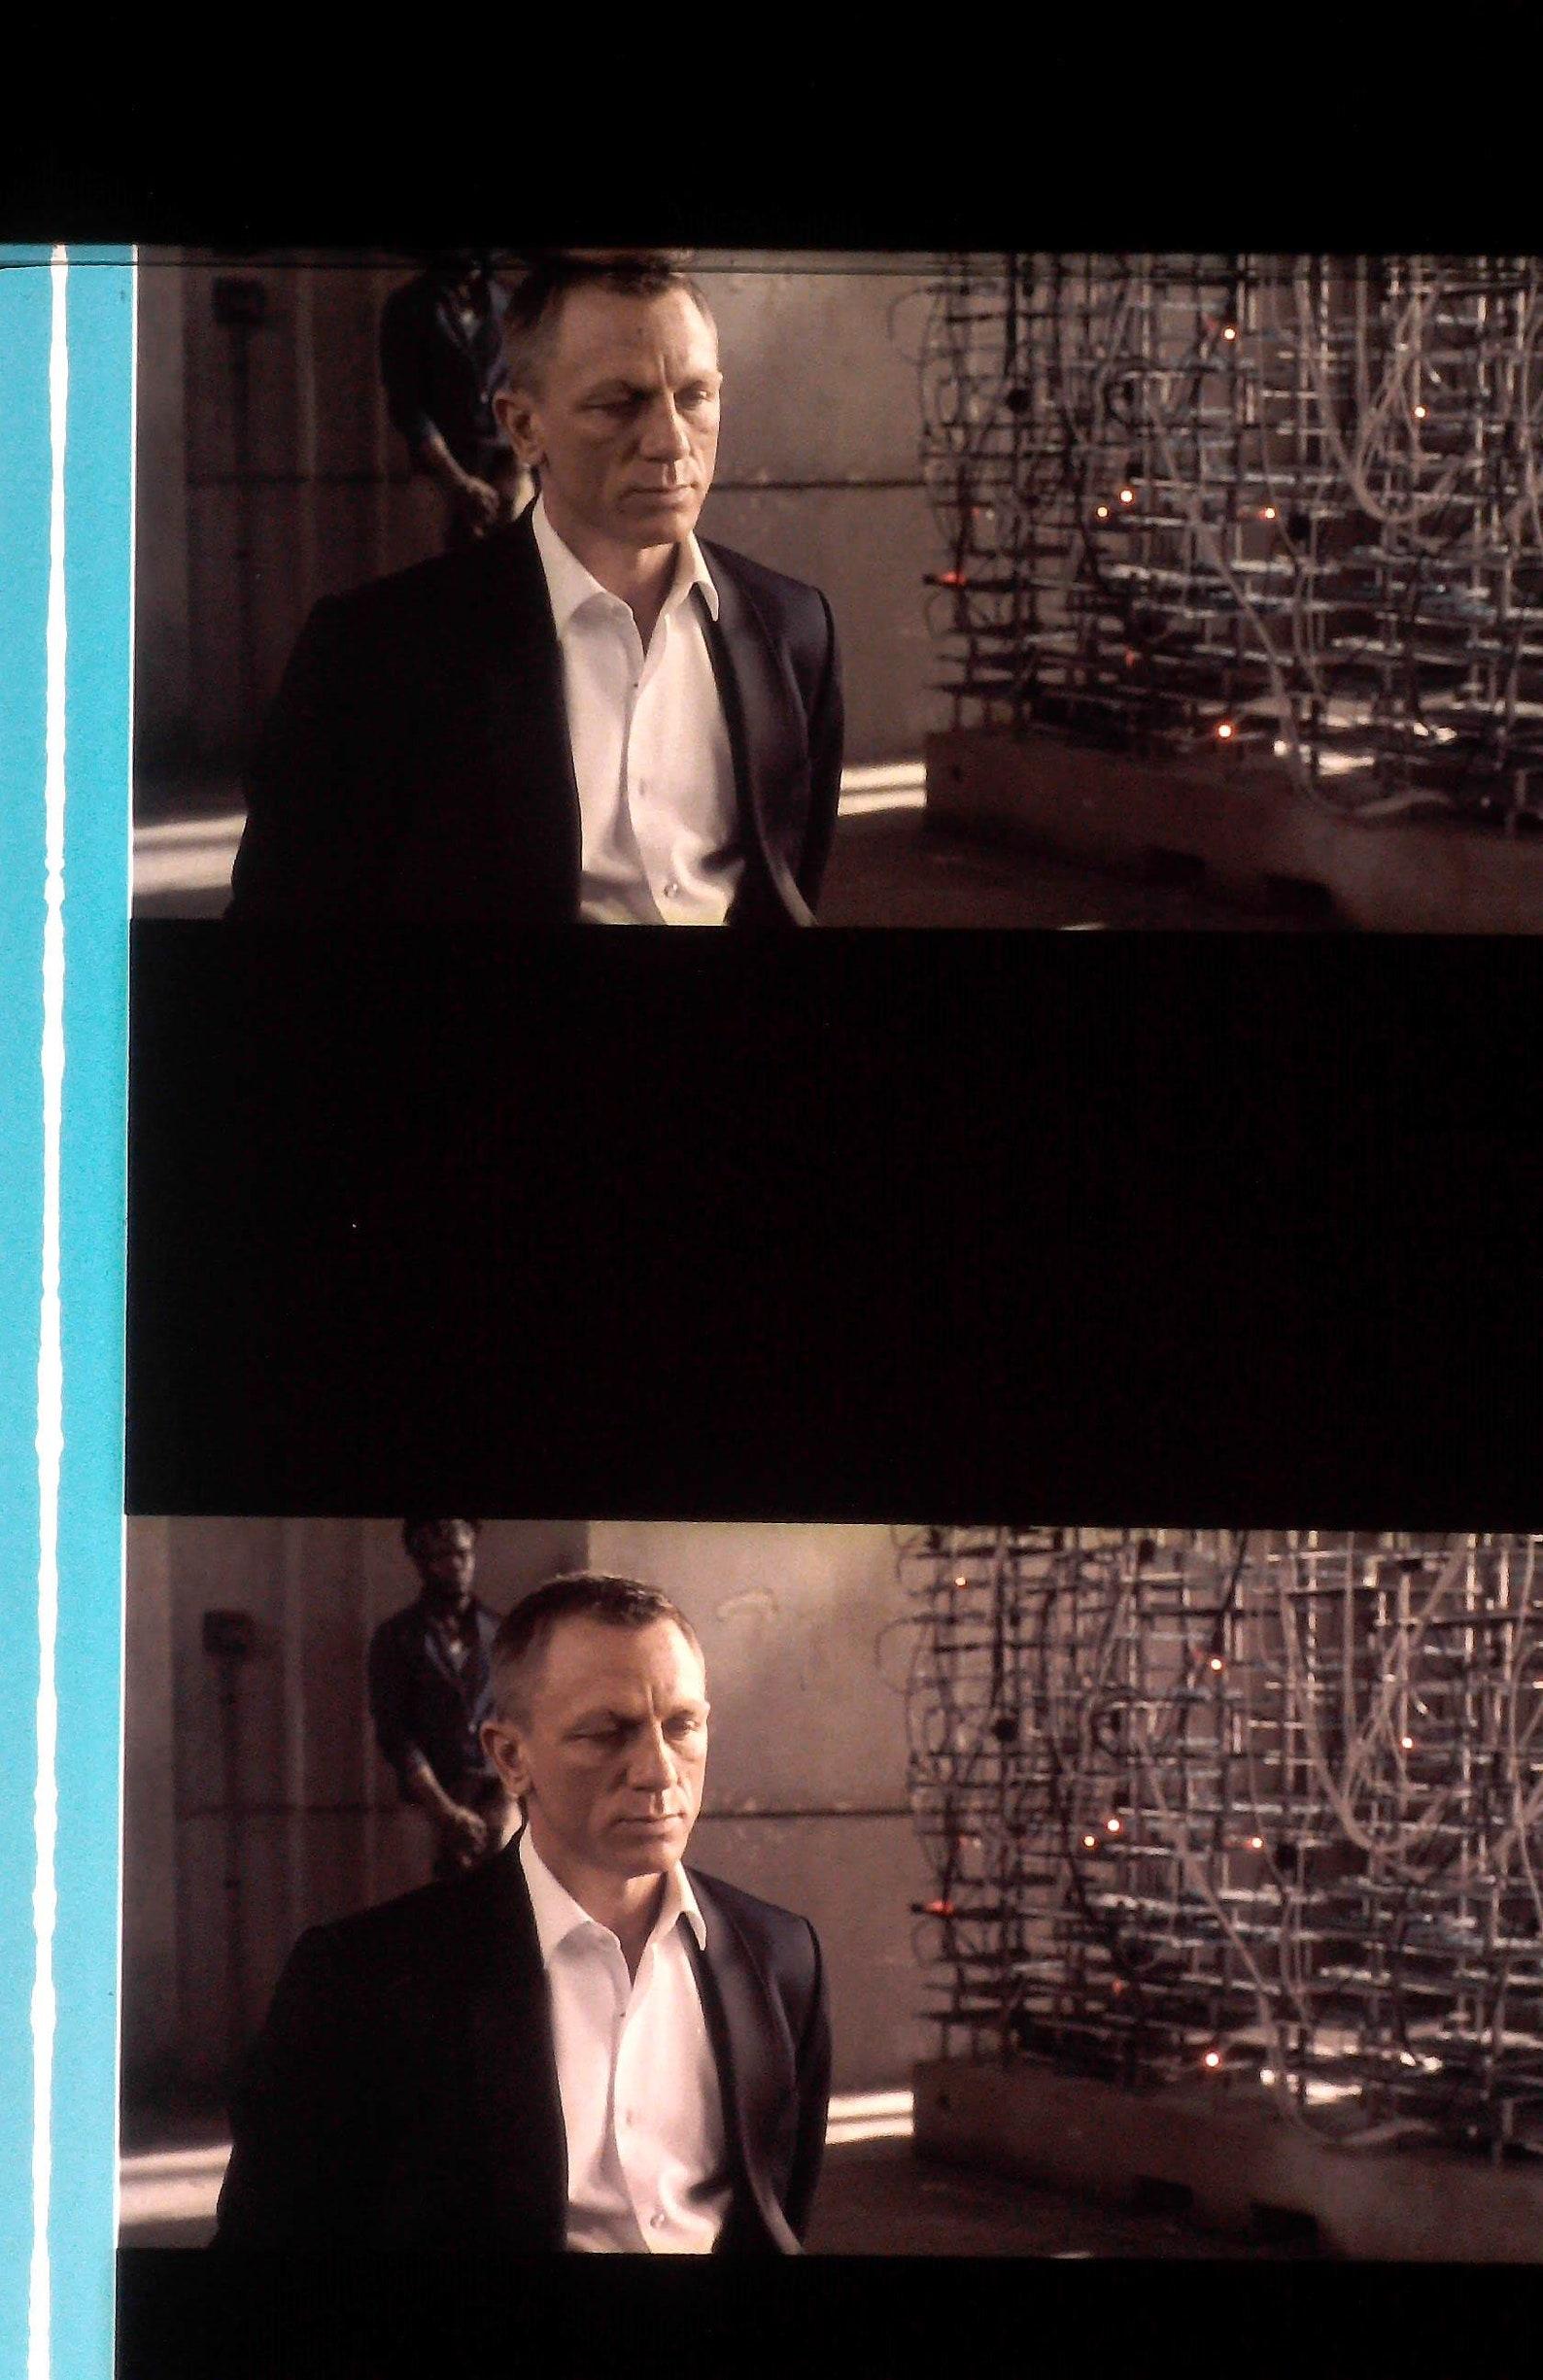 Skyfall (James Bond 007) - Free Online Movies & TV Shows